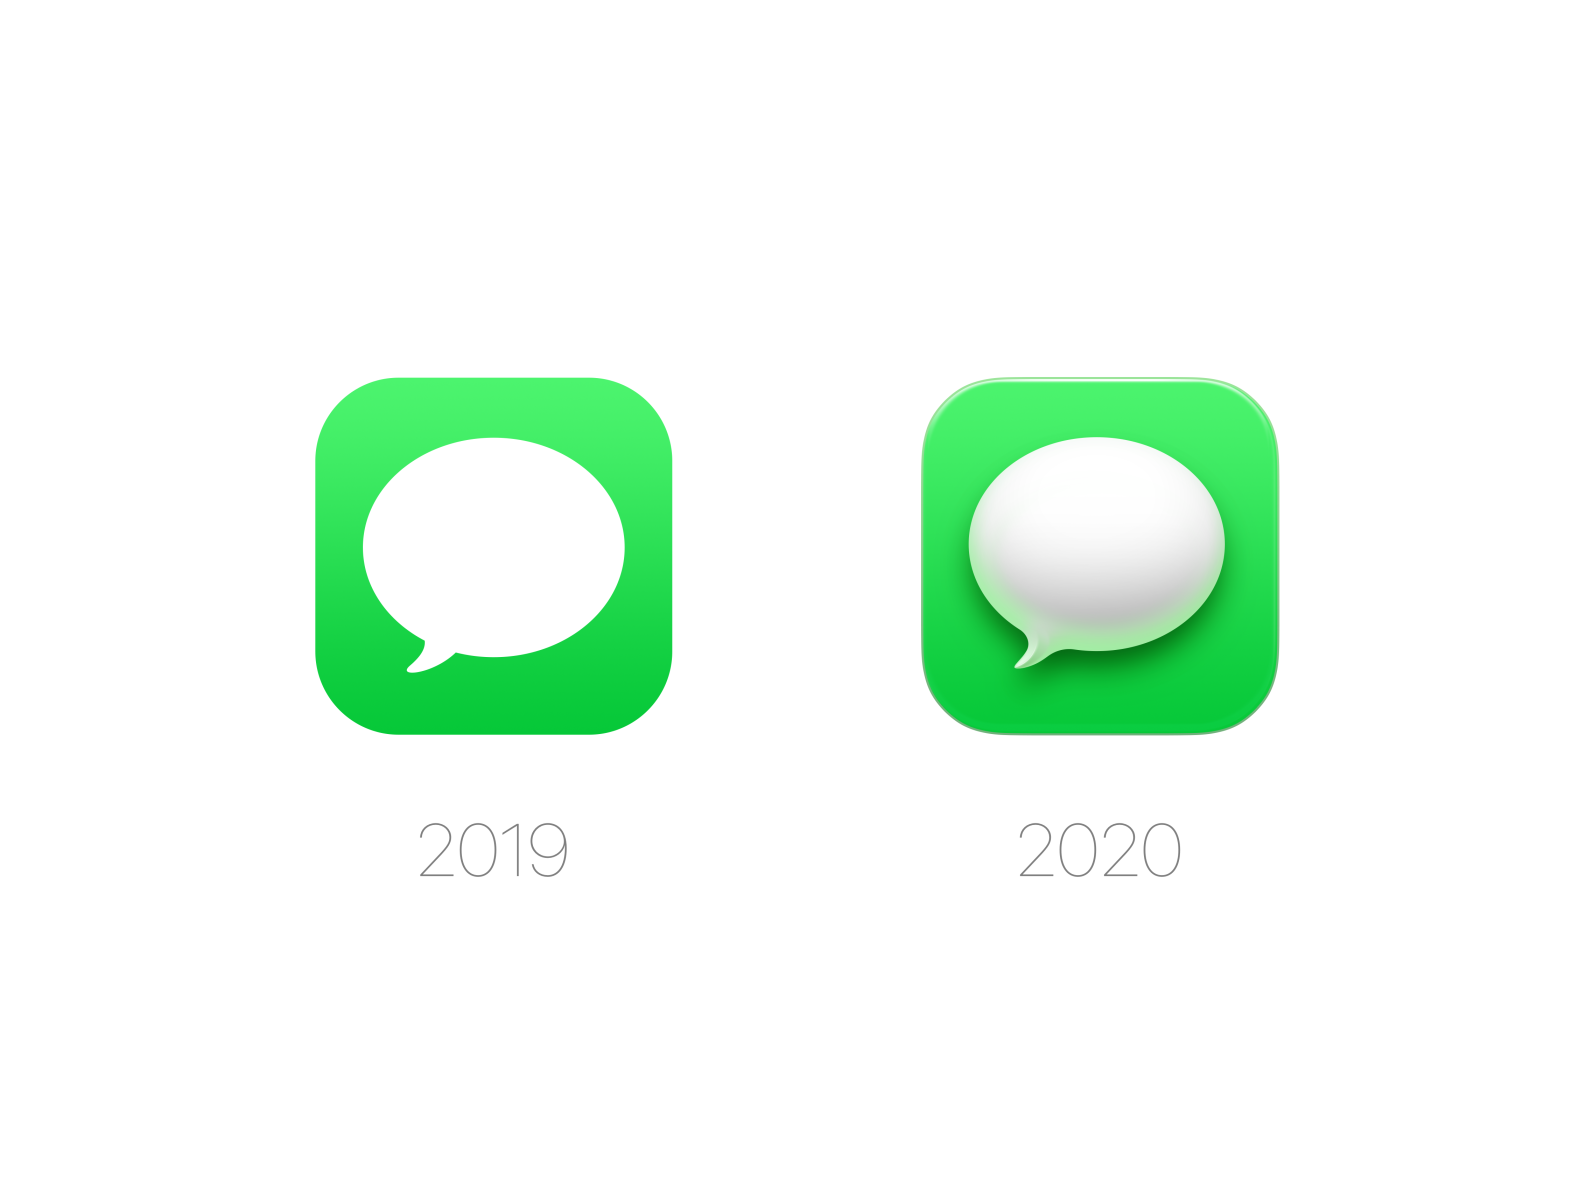 Messages Icon Macos Big Sur In 2020 Big Sur Icon Messages